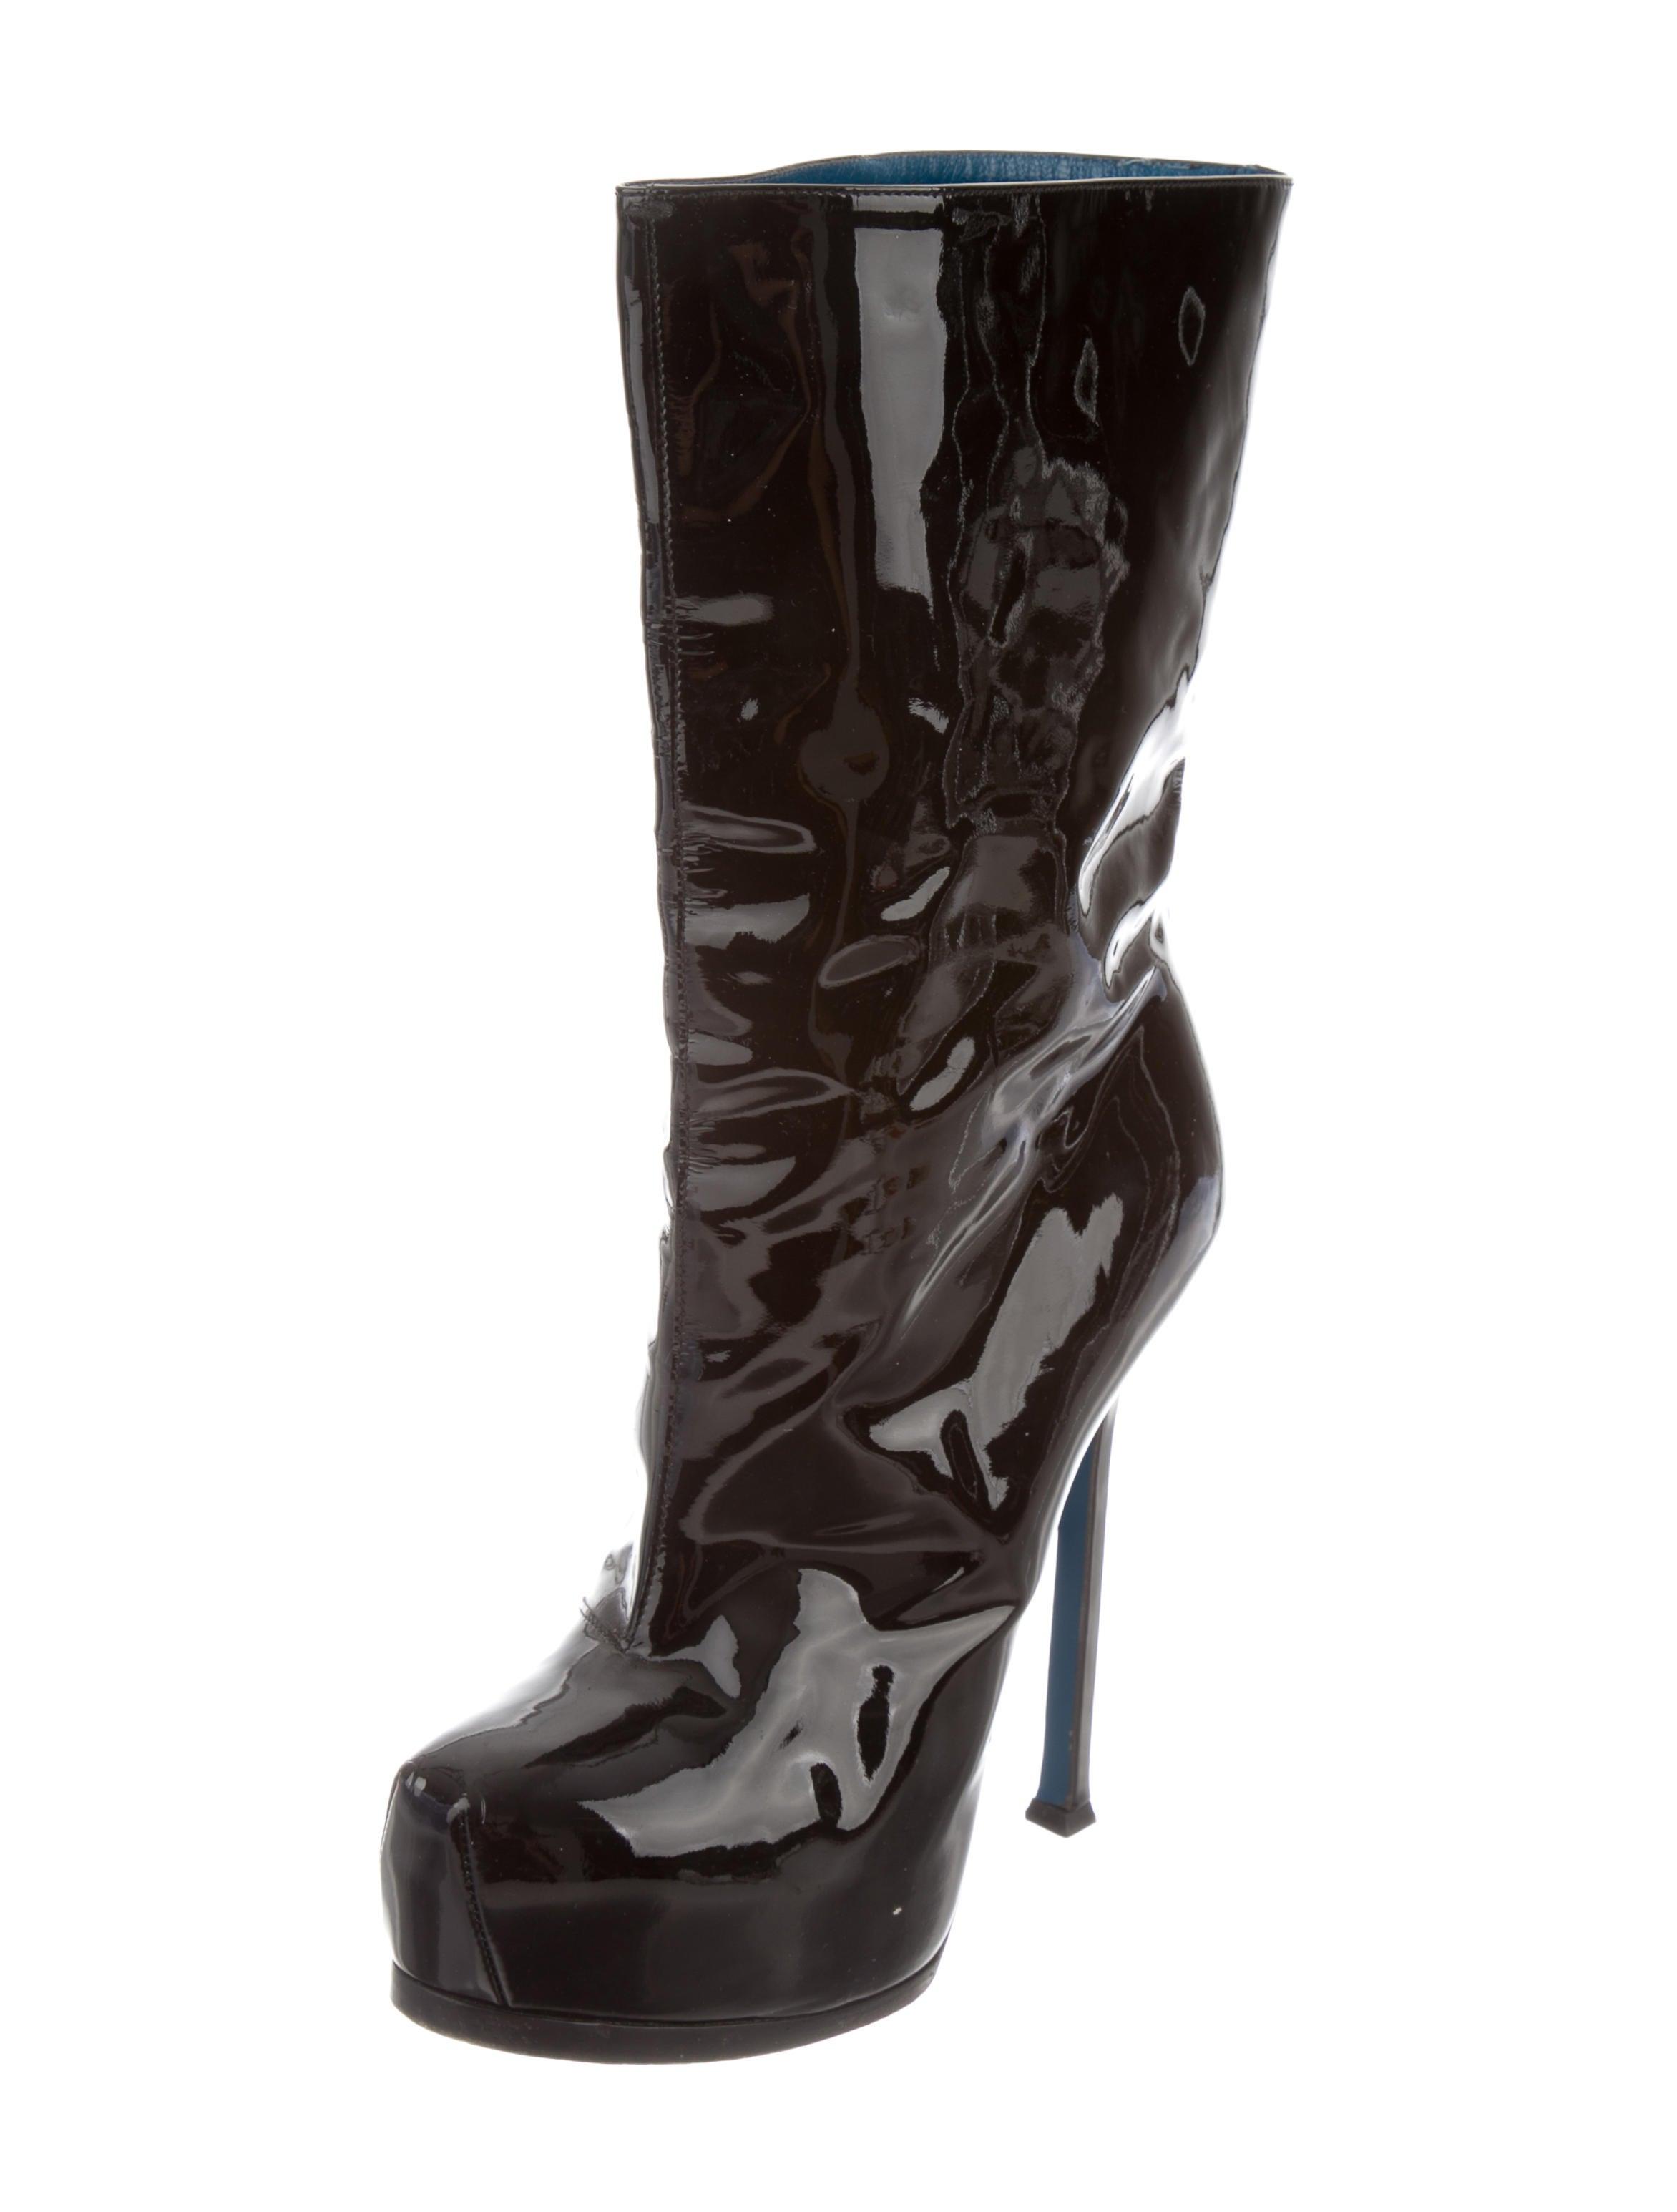 yves laurent patent leather platform boots shoes